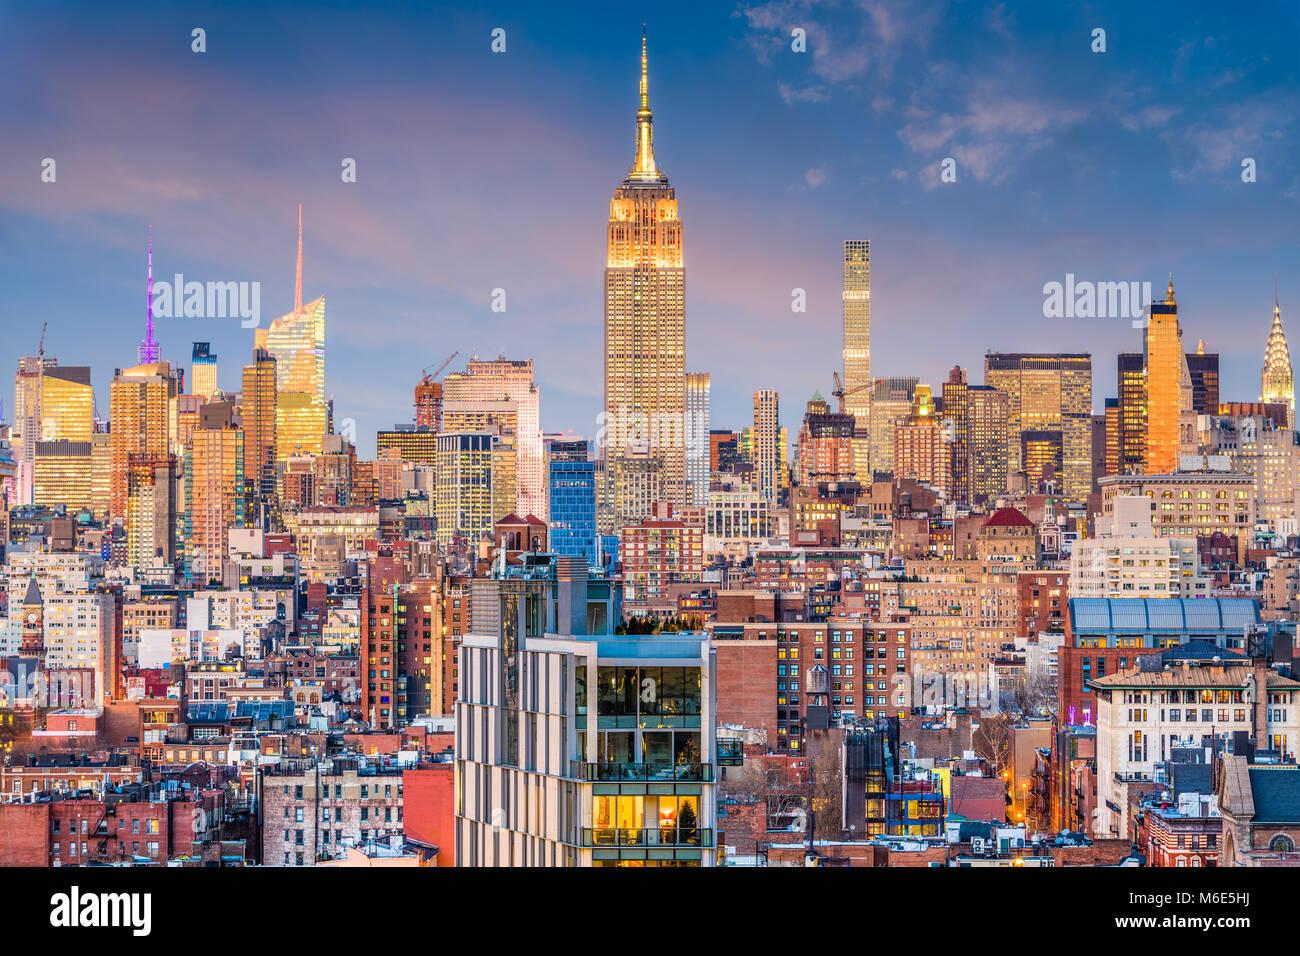 New York Midtown Manhattan skyline al tramonto. Immagini Stock